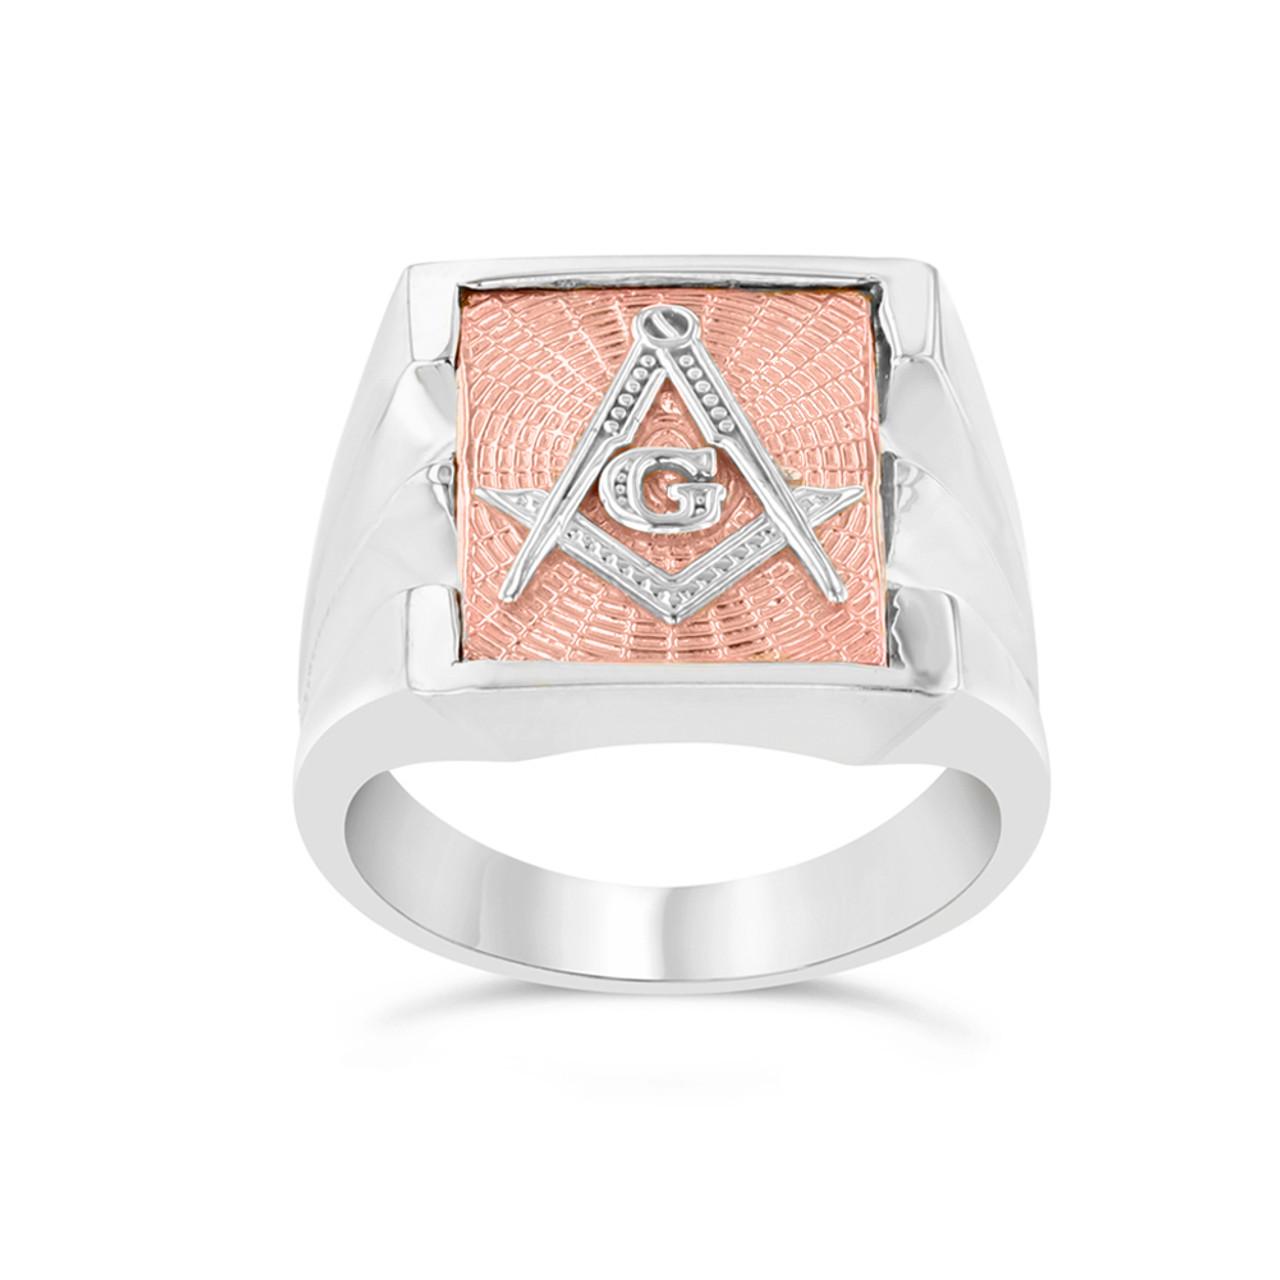 Men's Masonic Ring in Two-Tone White Gold